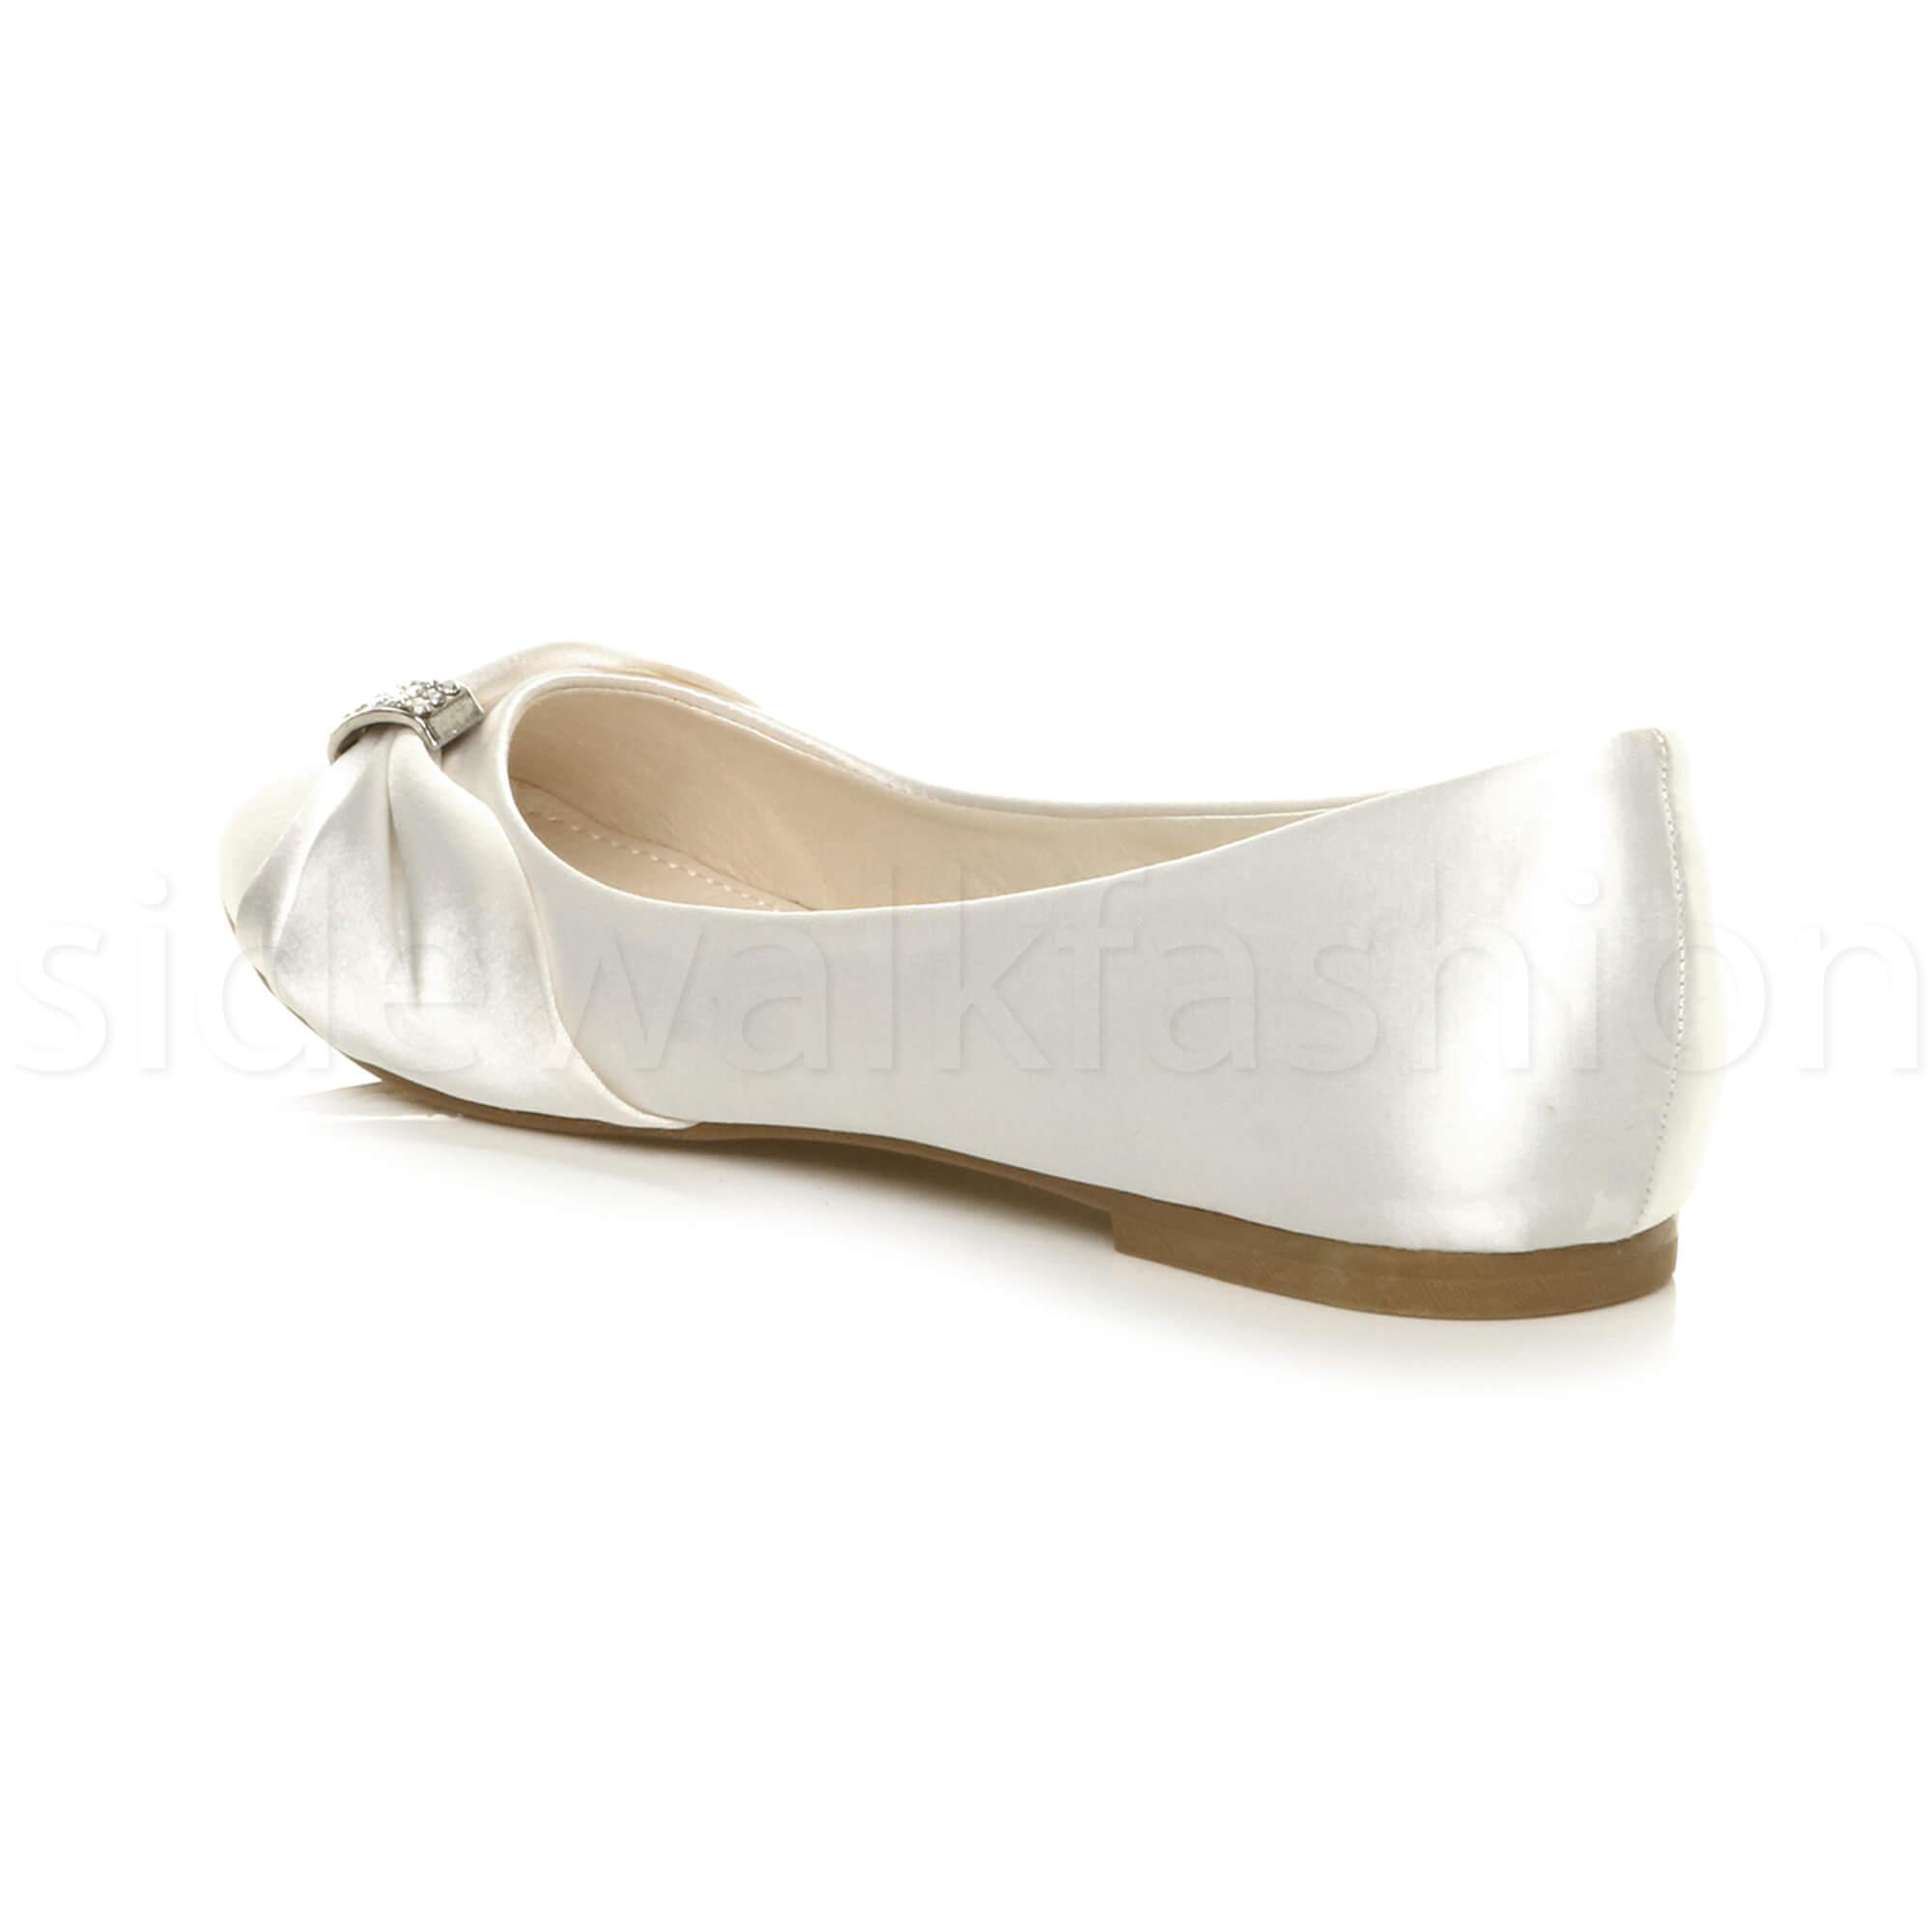 Womens-ladies-flat-wedding-bridesmaid-ruched-diamante-bridal-shoes-pumps-size thumbnail 37